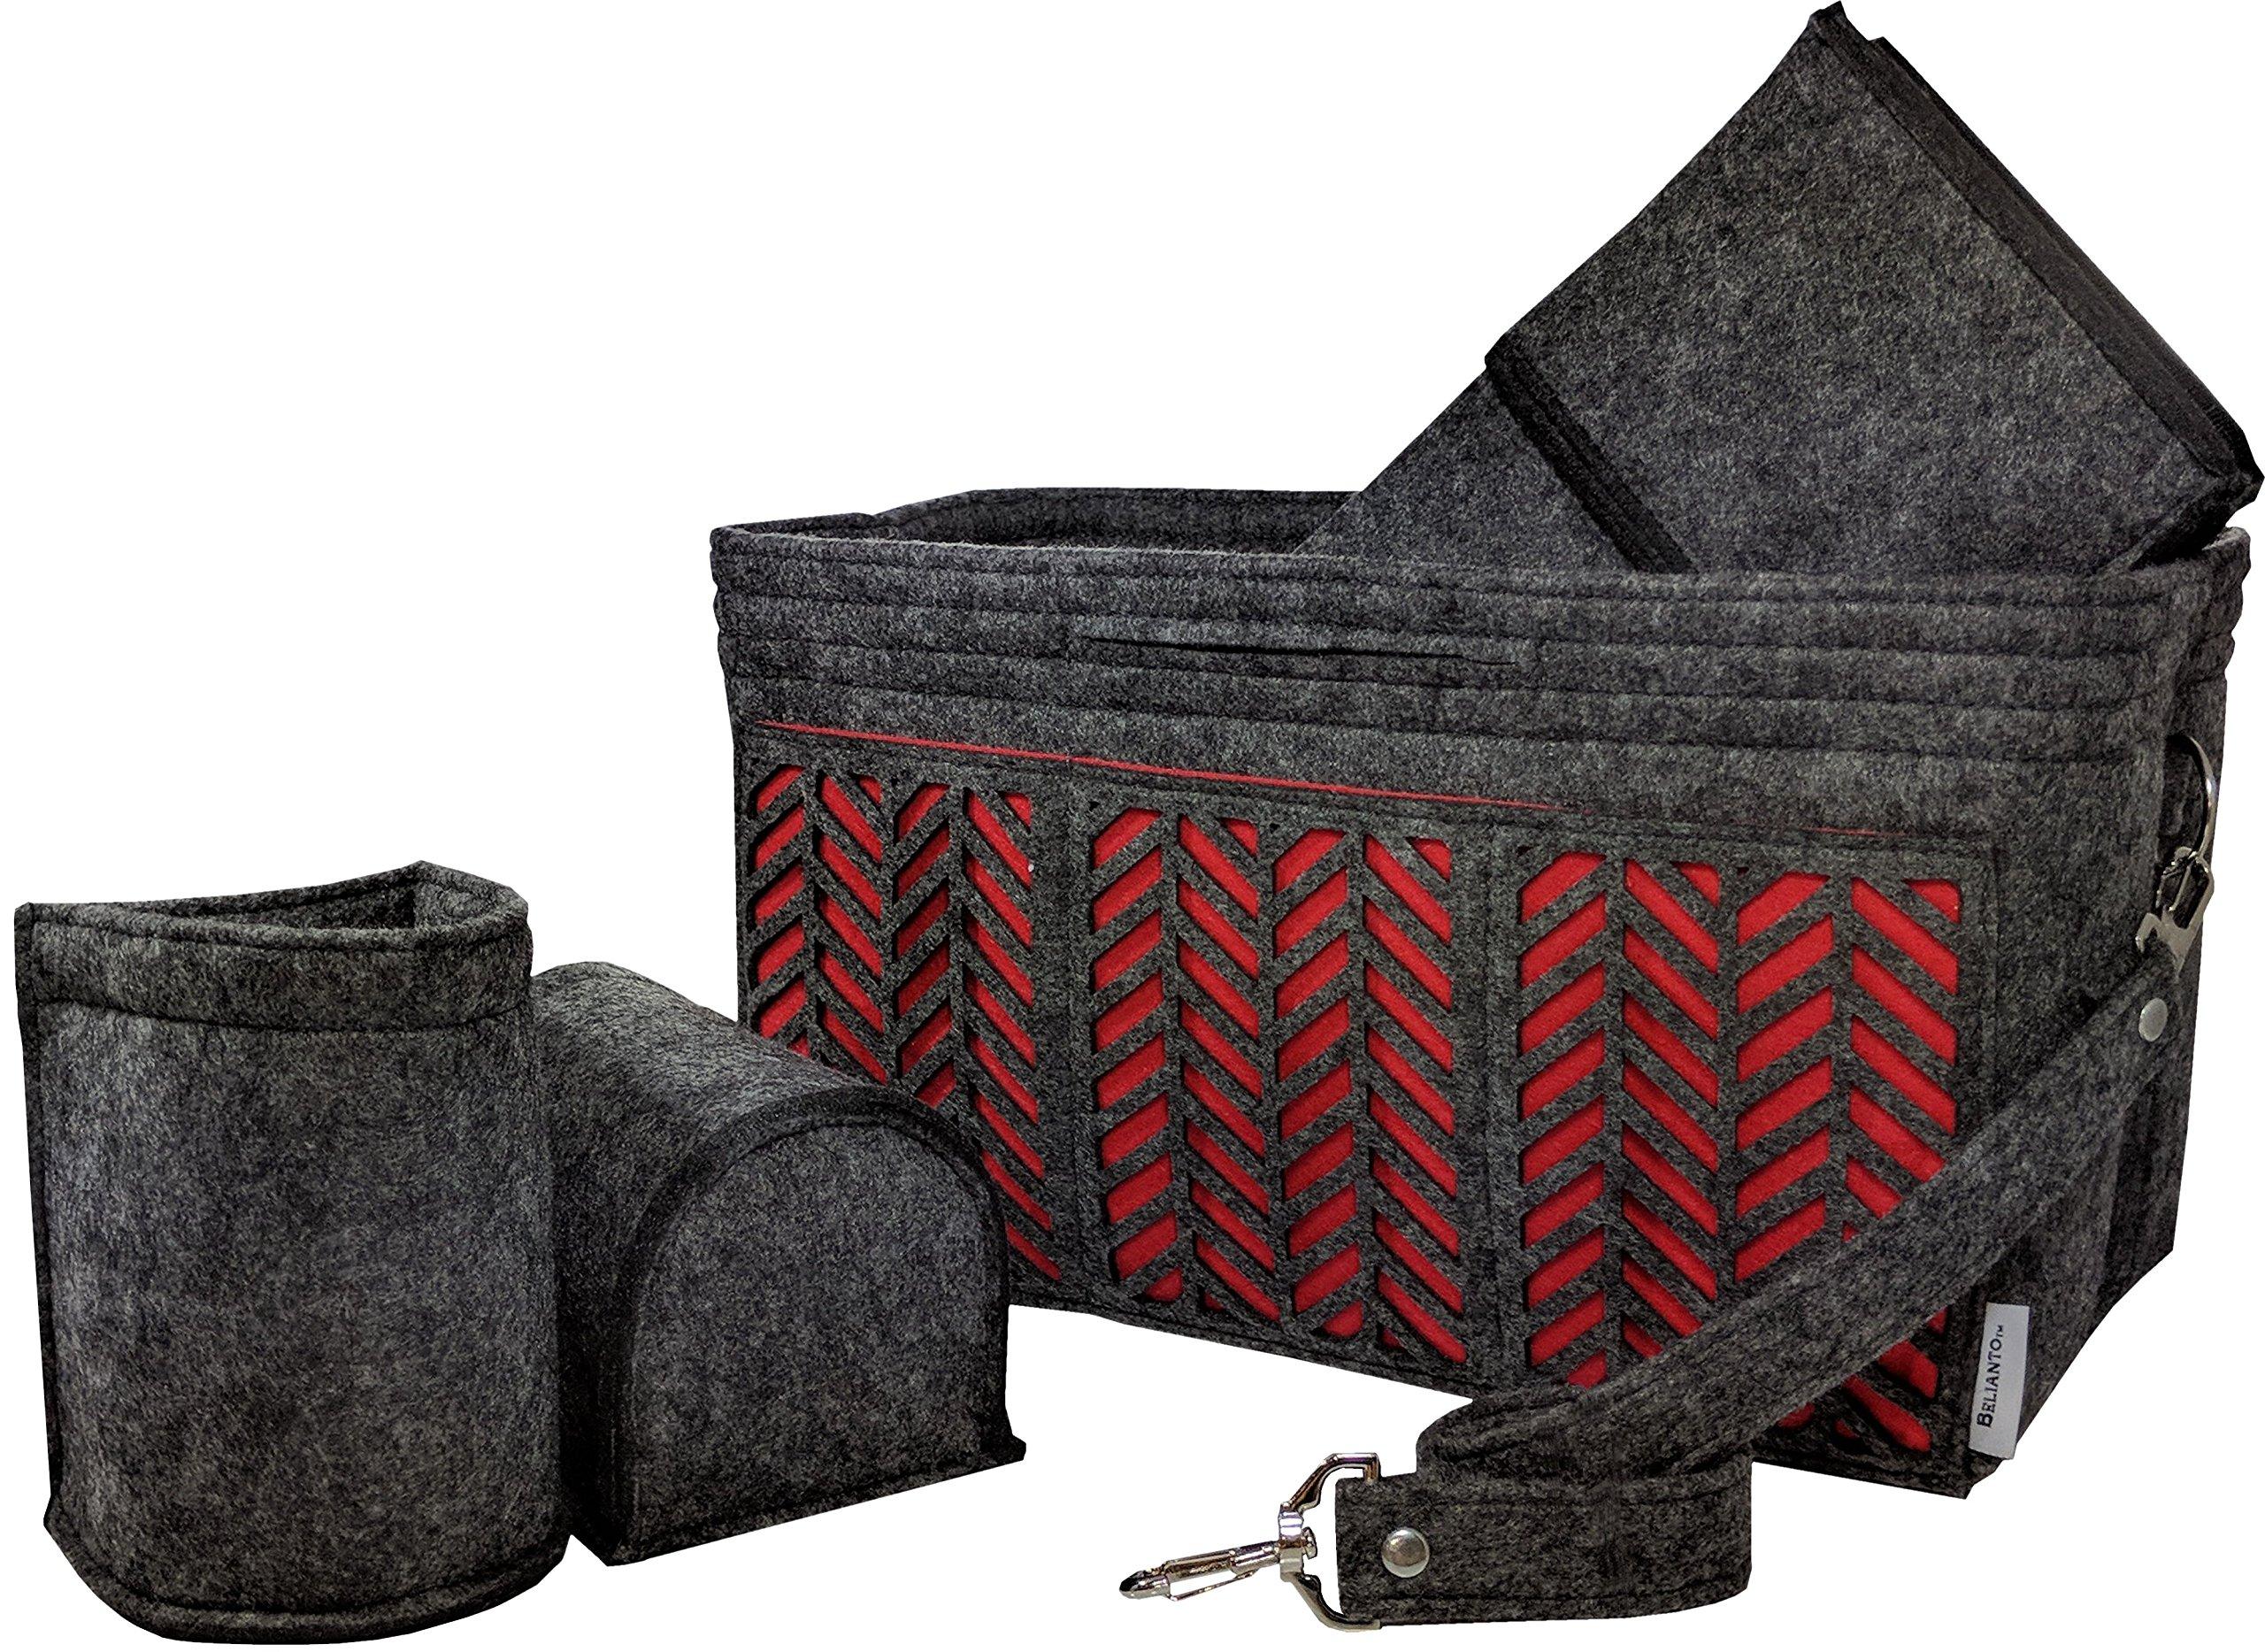 BELIANTO Felt Handbag Tote Purse Organizer Insert with Middle Insert, Bottle Holders, Key finder, D rings (Herringbone Pattern) (X-Large, Dark Grey) by BELIANTO